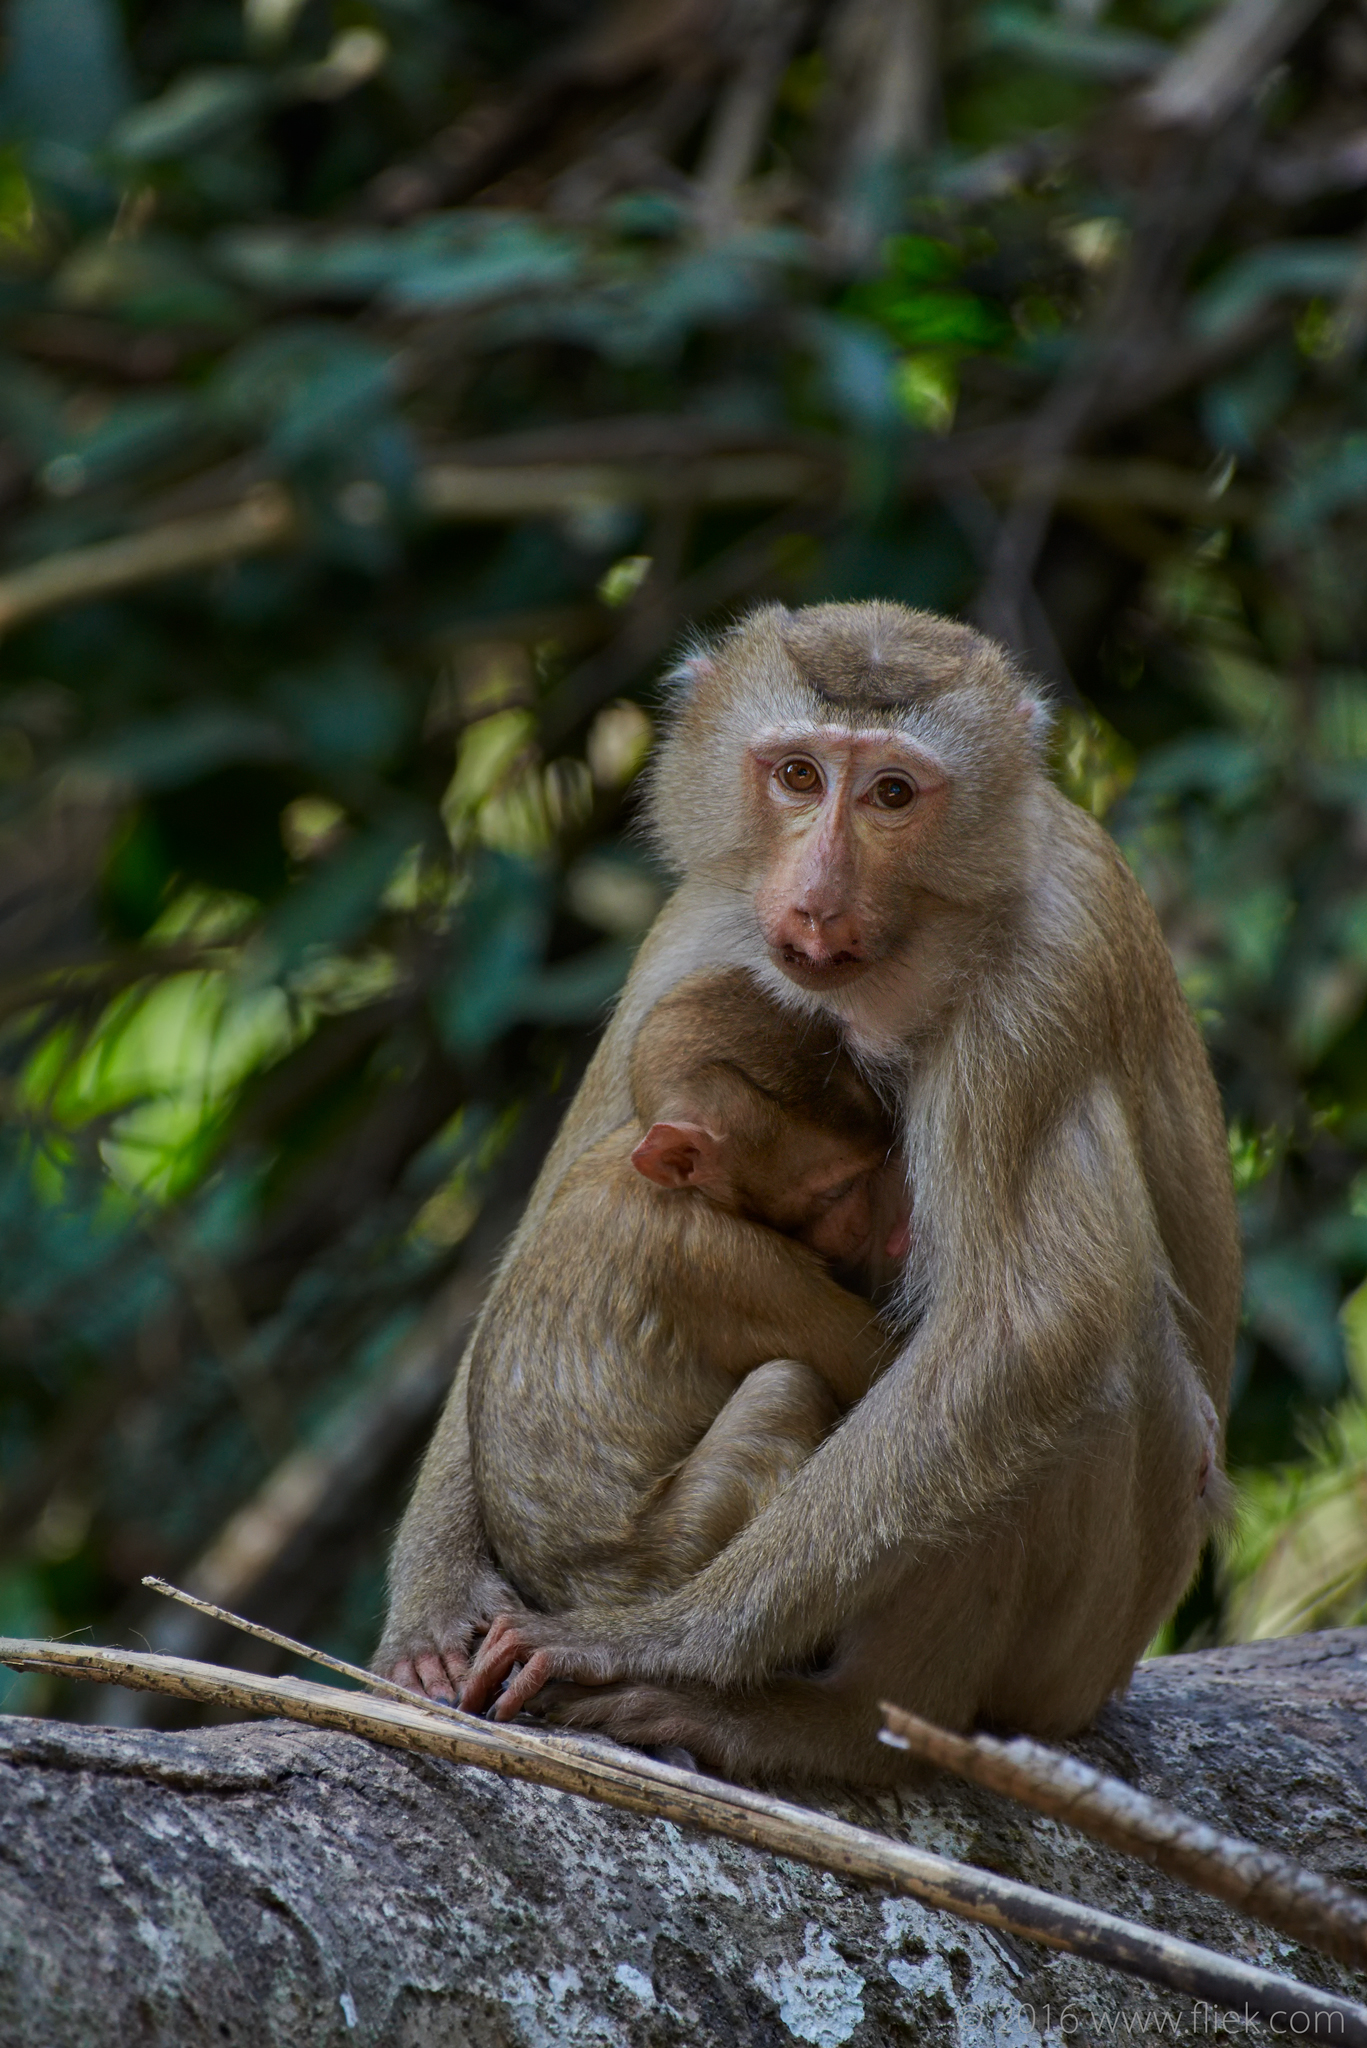 Khao Yai Macaque Nikon 200-500mm f5.6